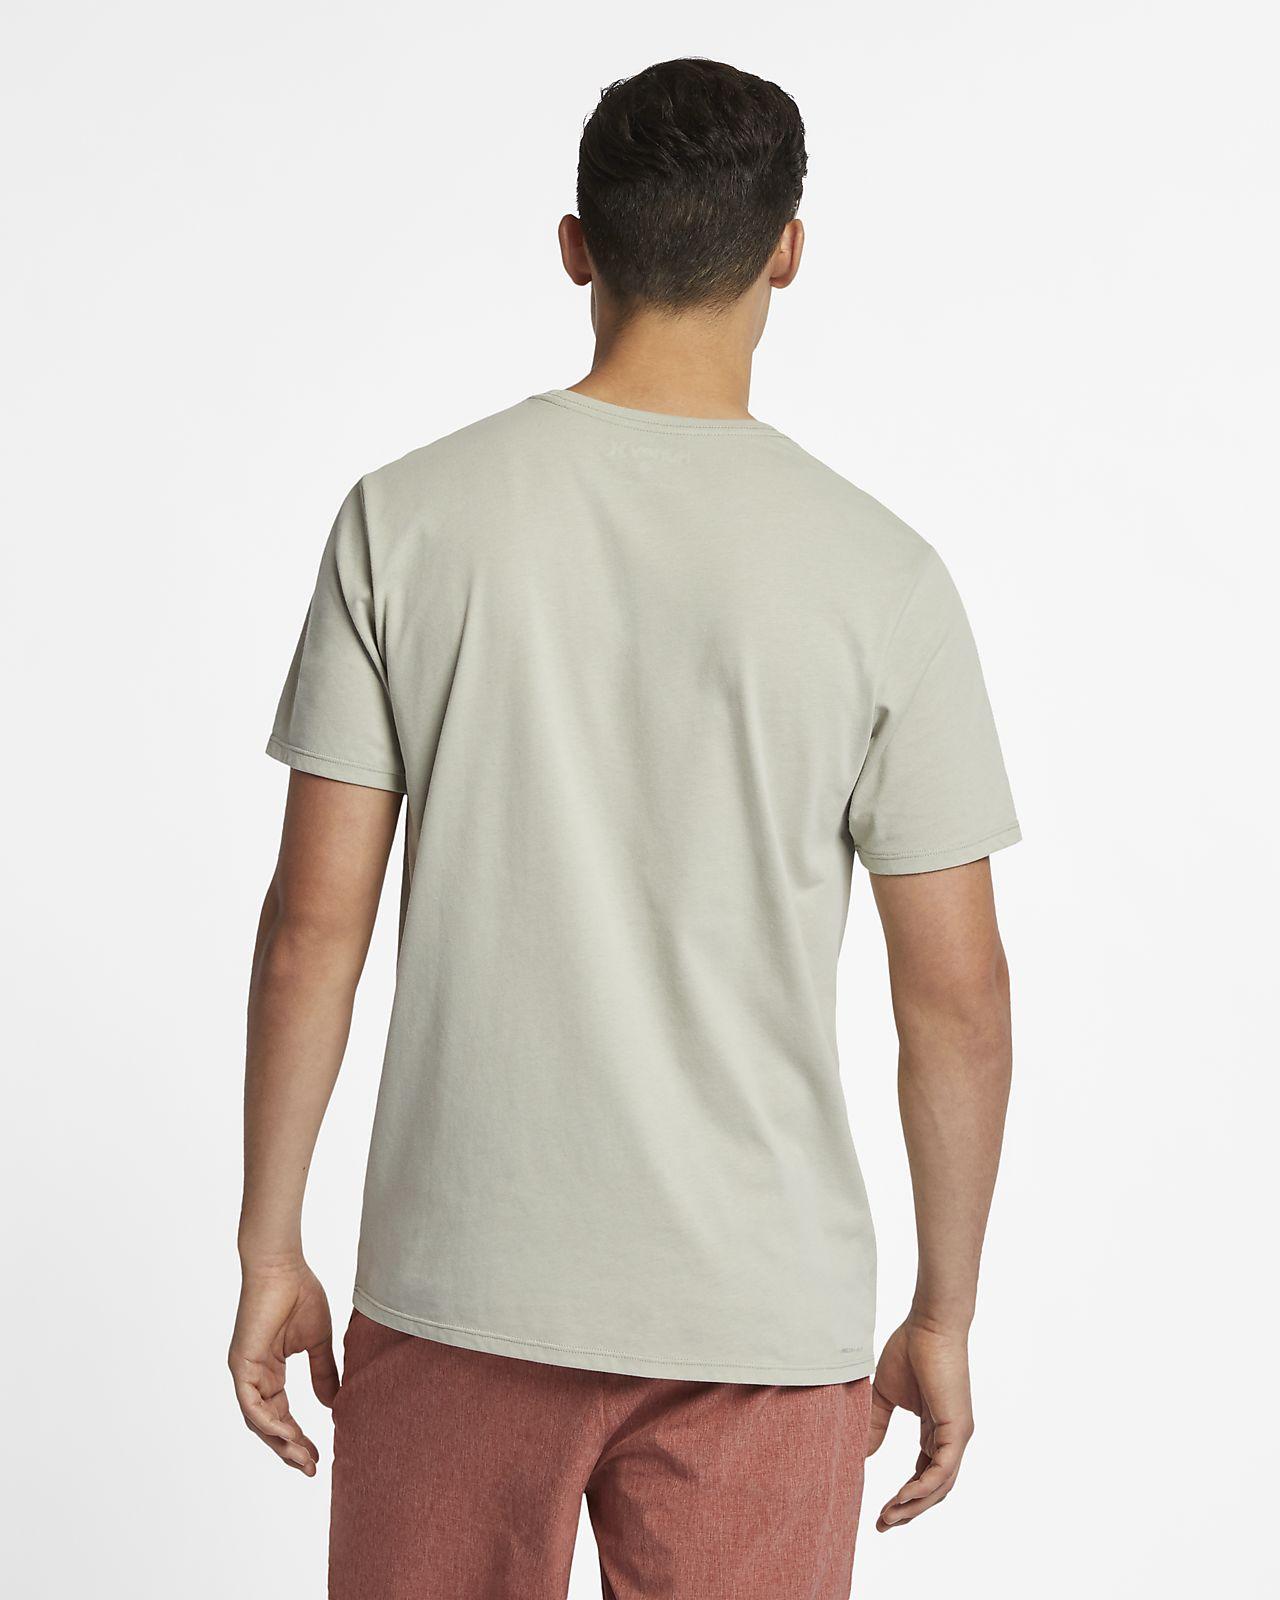 8e48cb94cfcd Hurley Dri-FIT Surf And Enjoy Men s T-Shirt. Nike.com